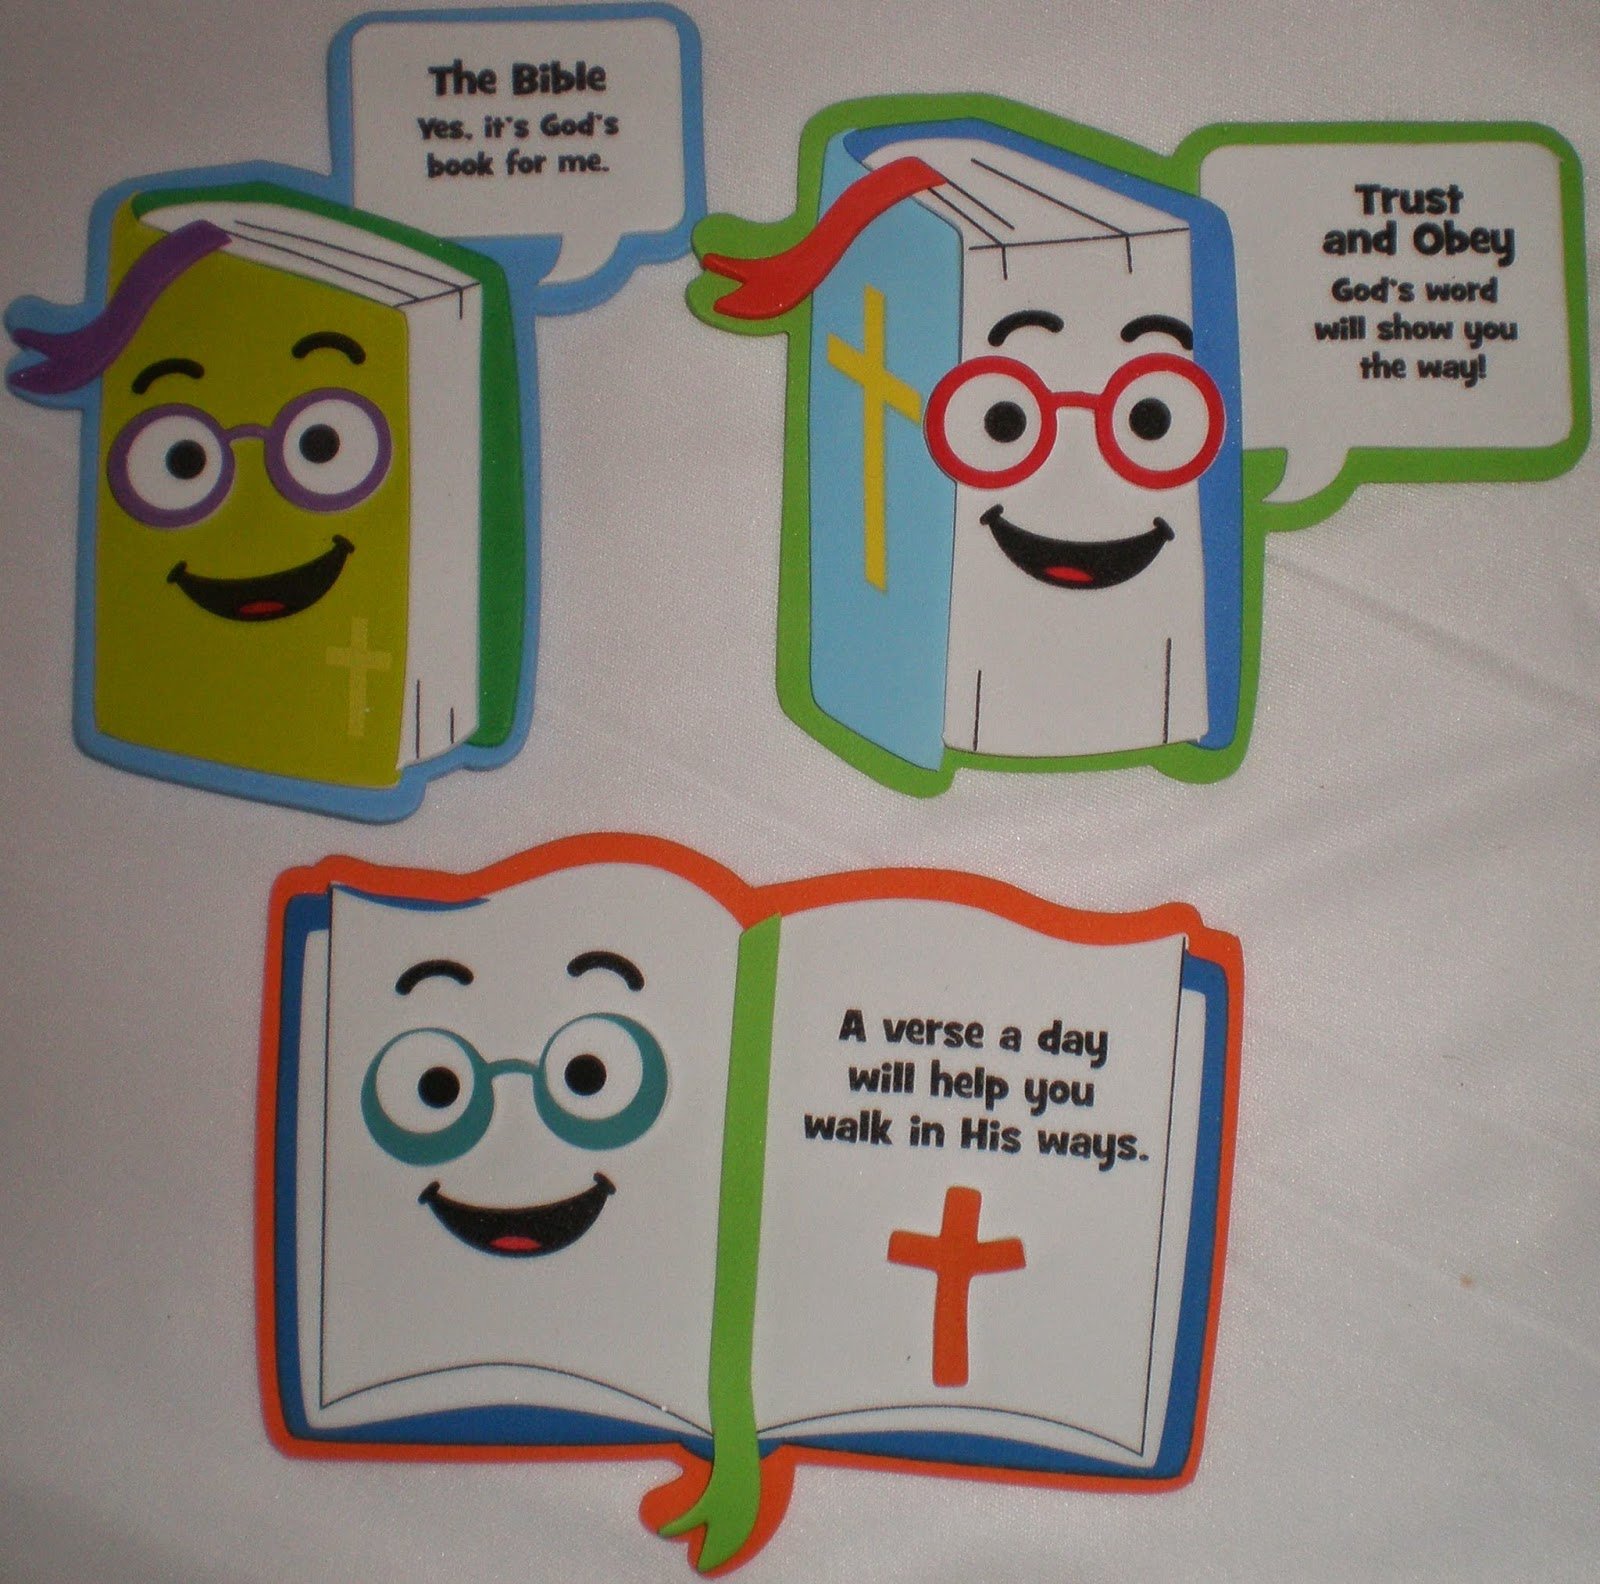 petersham bible book u0026 tract depot bible foam magnet craft kit